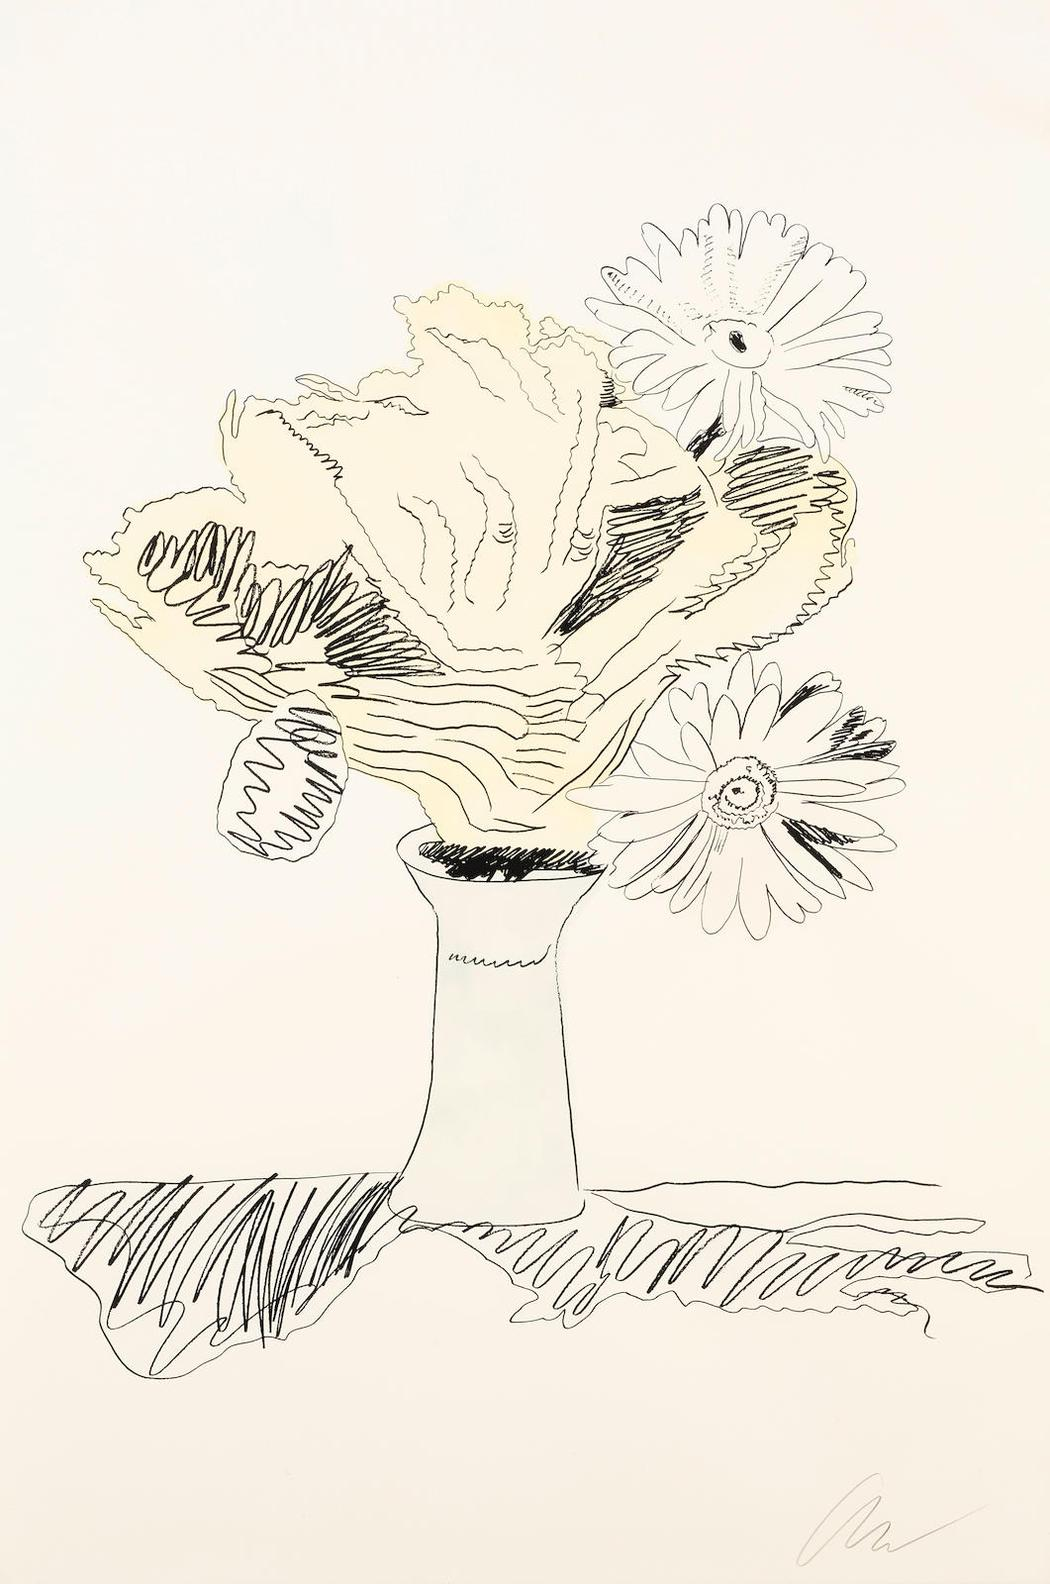 Andy Warhol-Flowers (Hand-Colored) (F./S. II.113)-1974